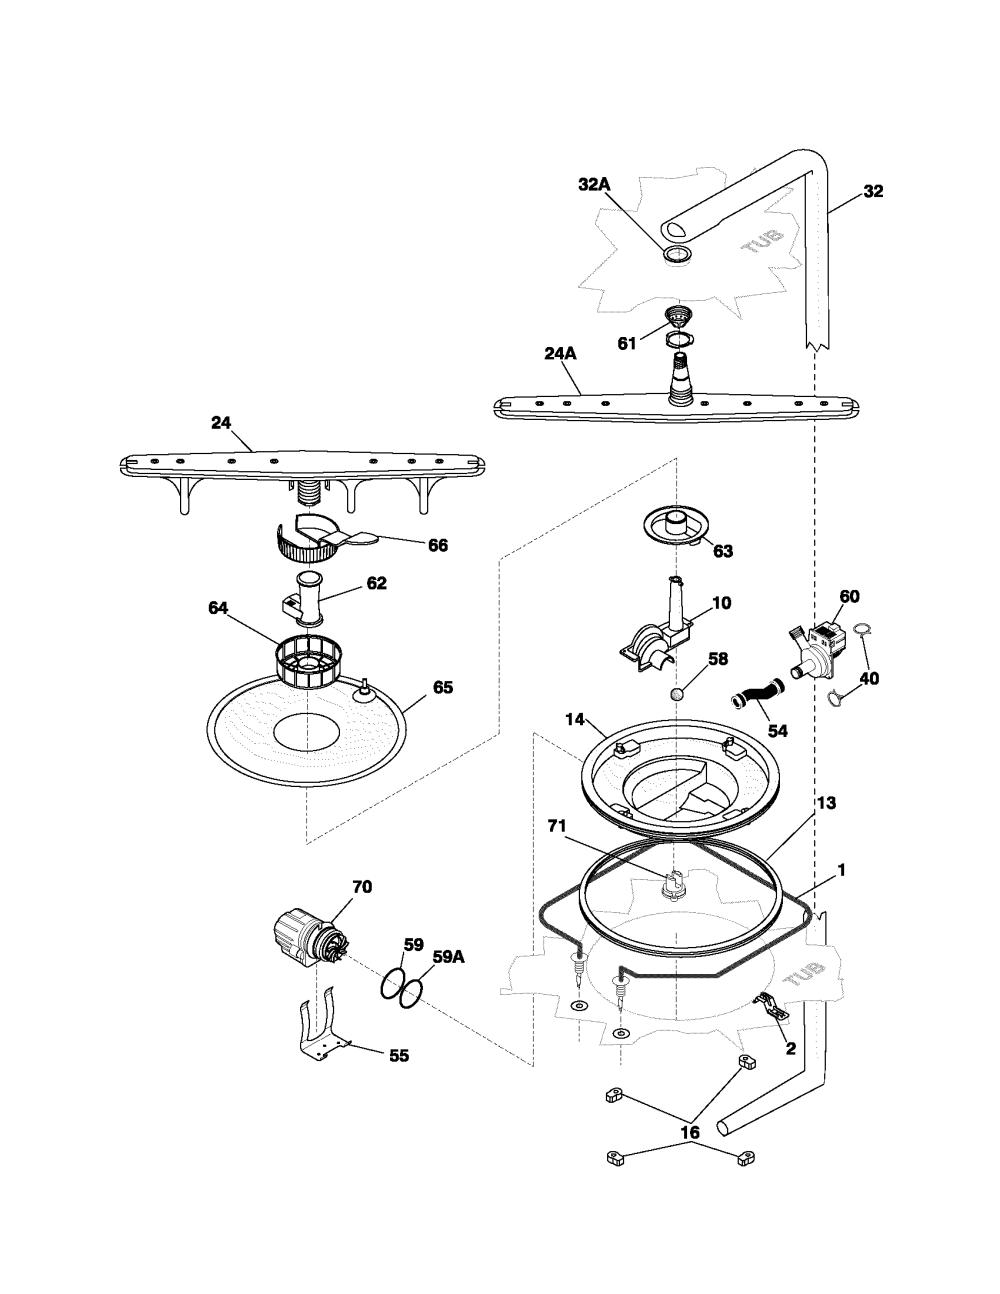 medium resolution of frigidaire dishwasher hose diagram wiring diagrams frigidaire dishwasher hose diagram